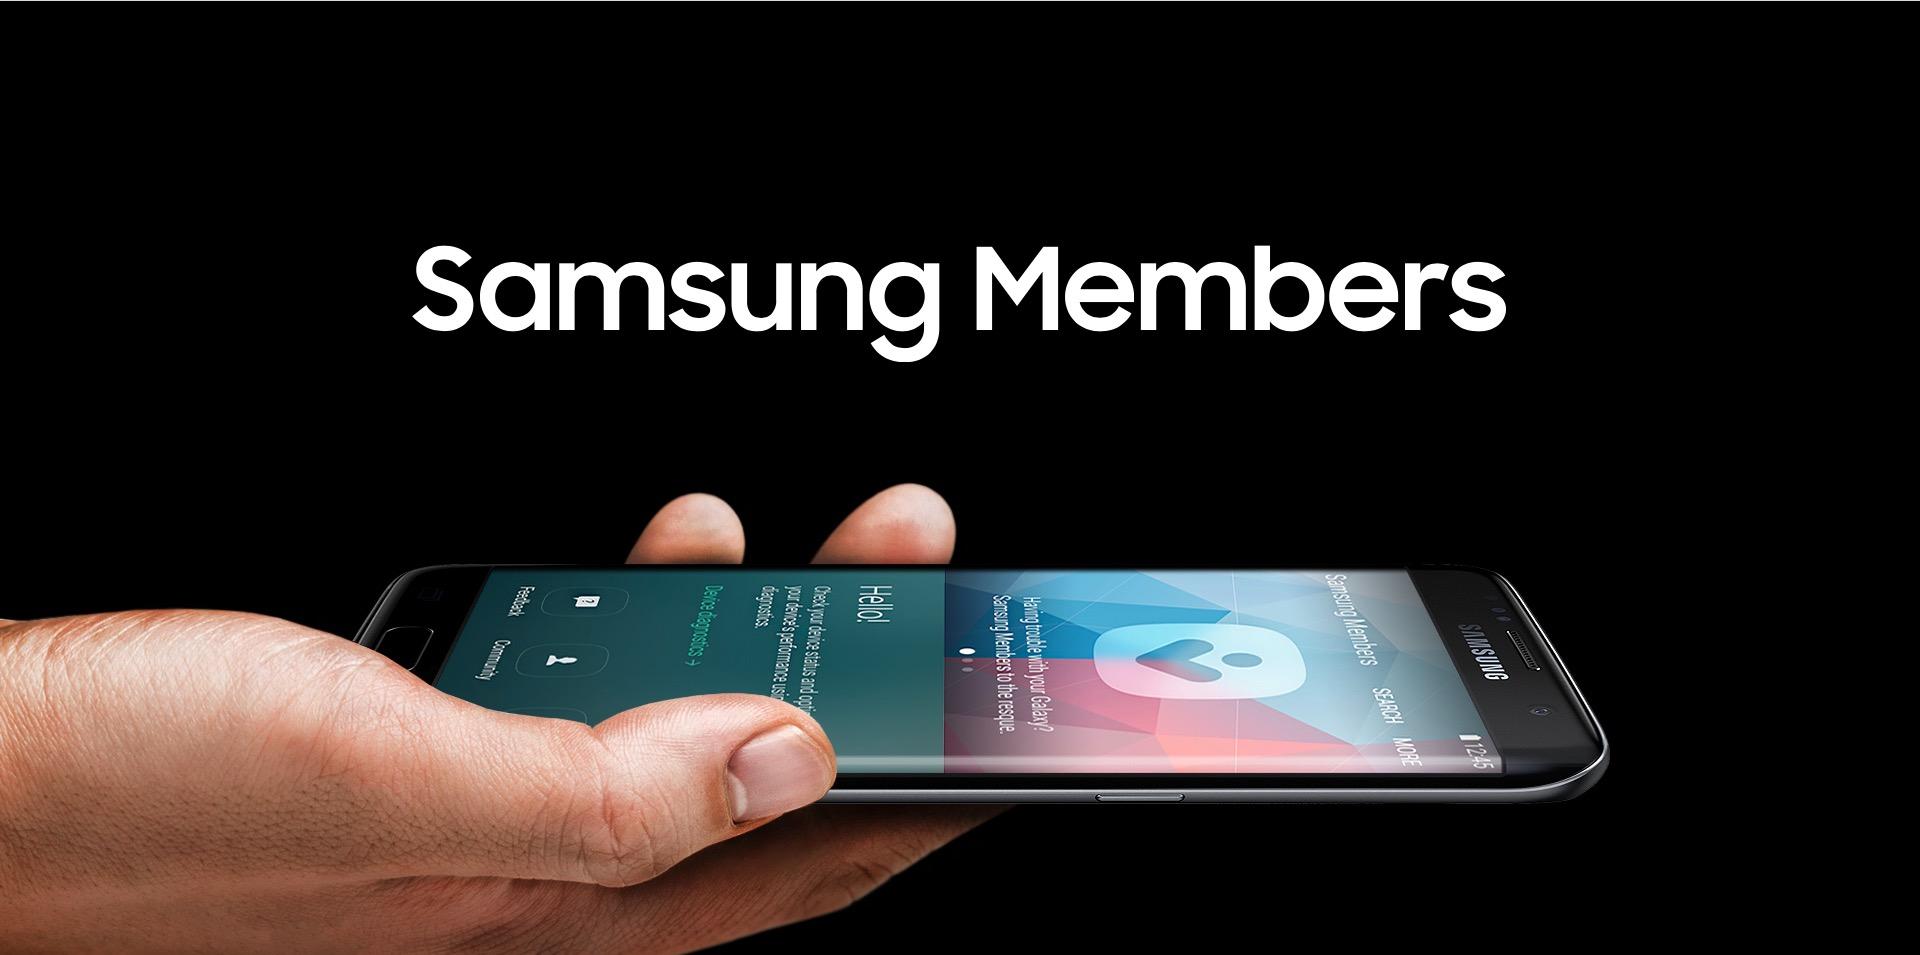 Samsung Members